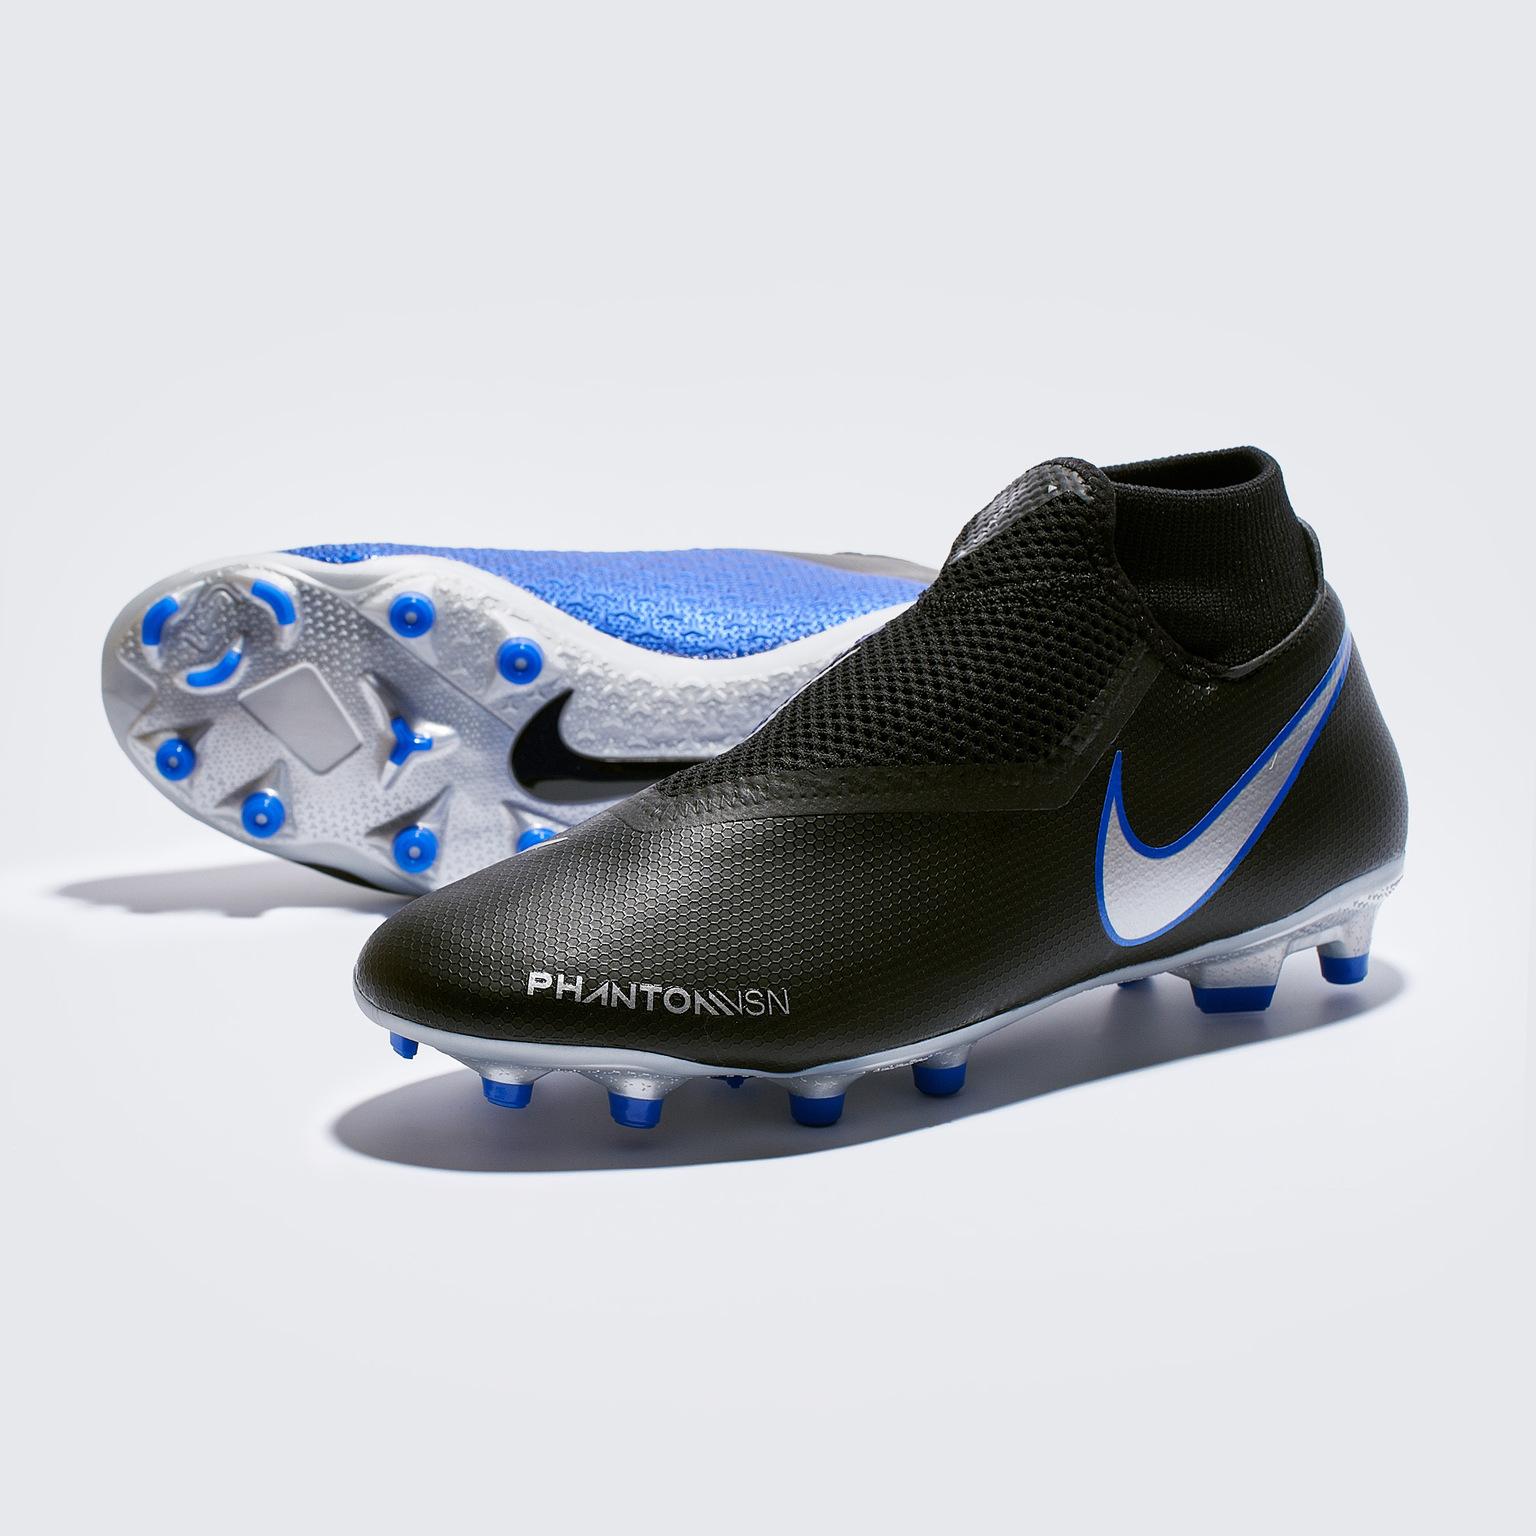 Бутсы Nike Phantom 3 Academy DF MG AO3258-004 бутсы nike phantom 3 academy df fg ah7268 081